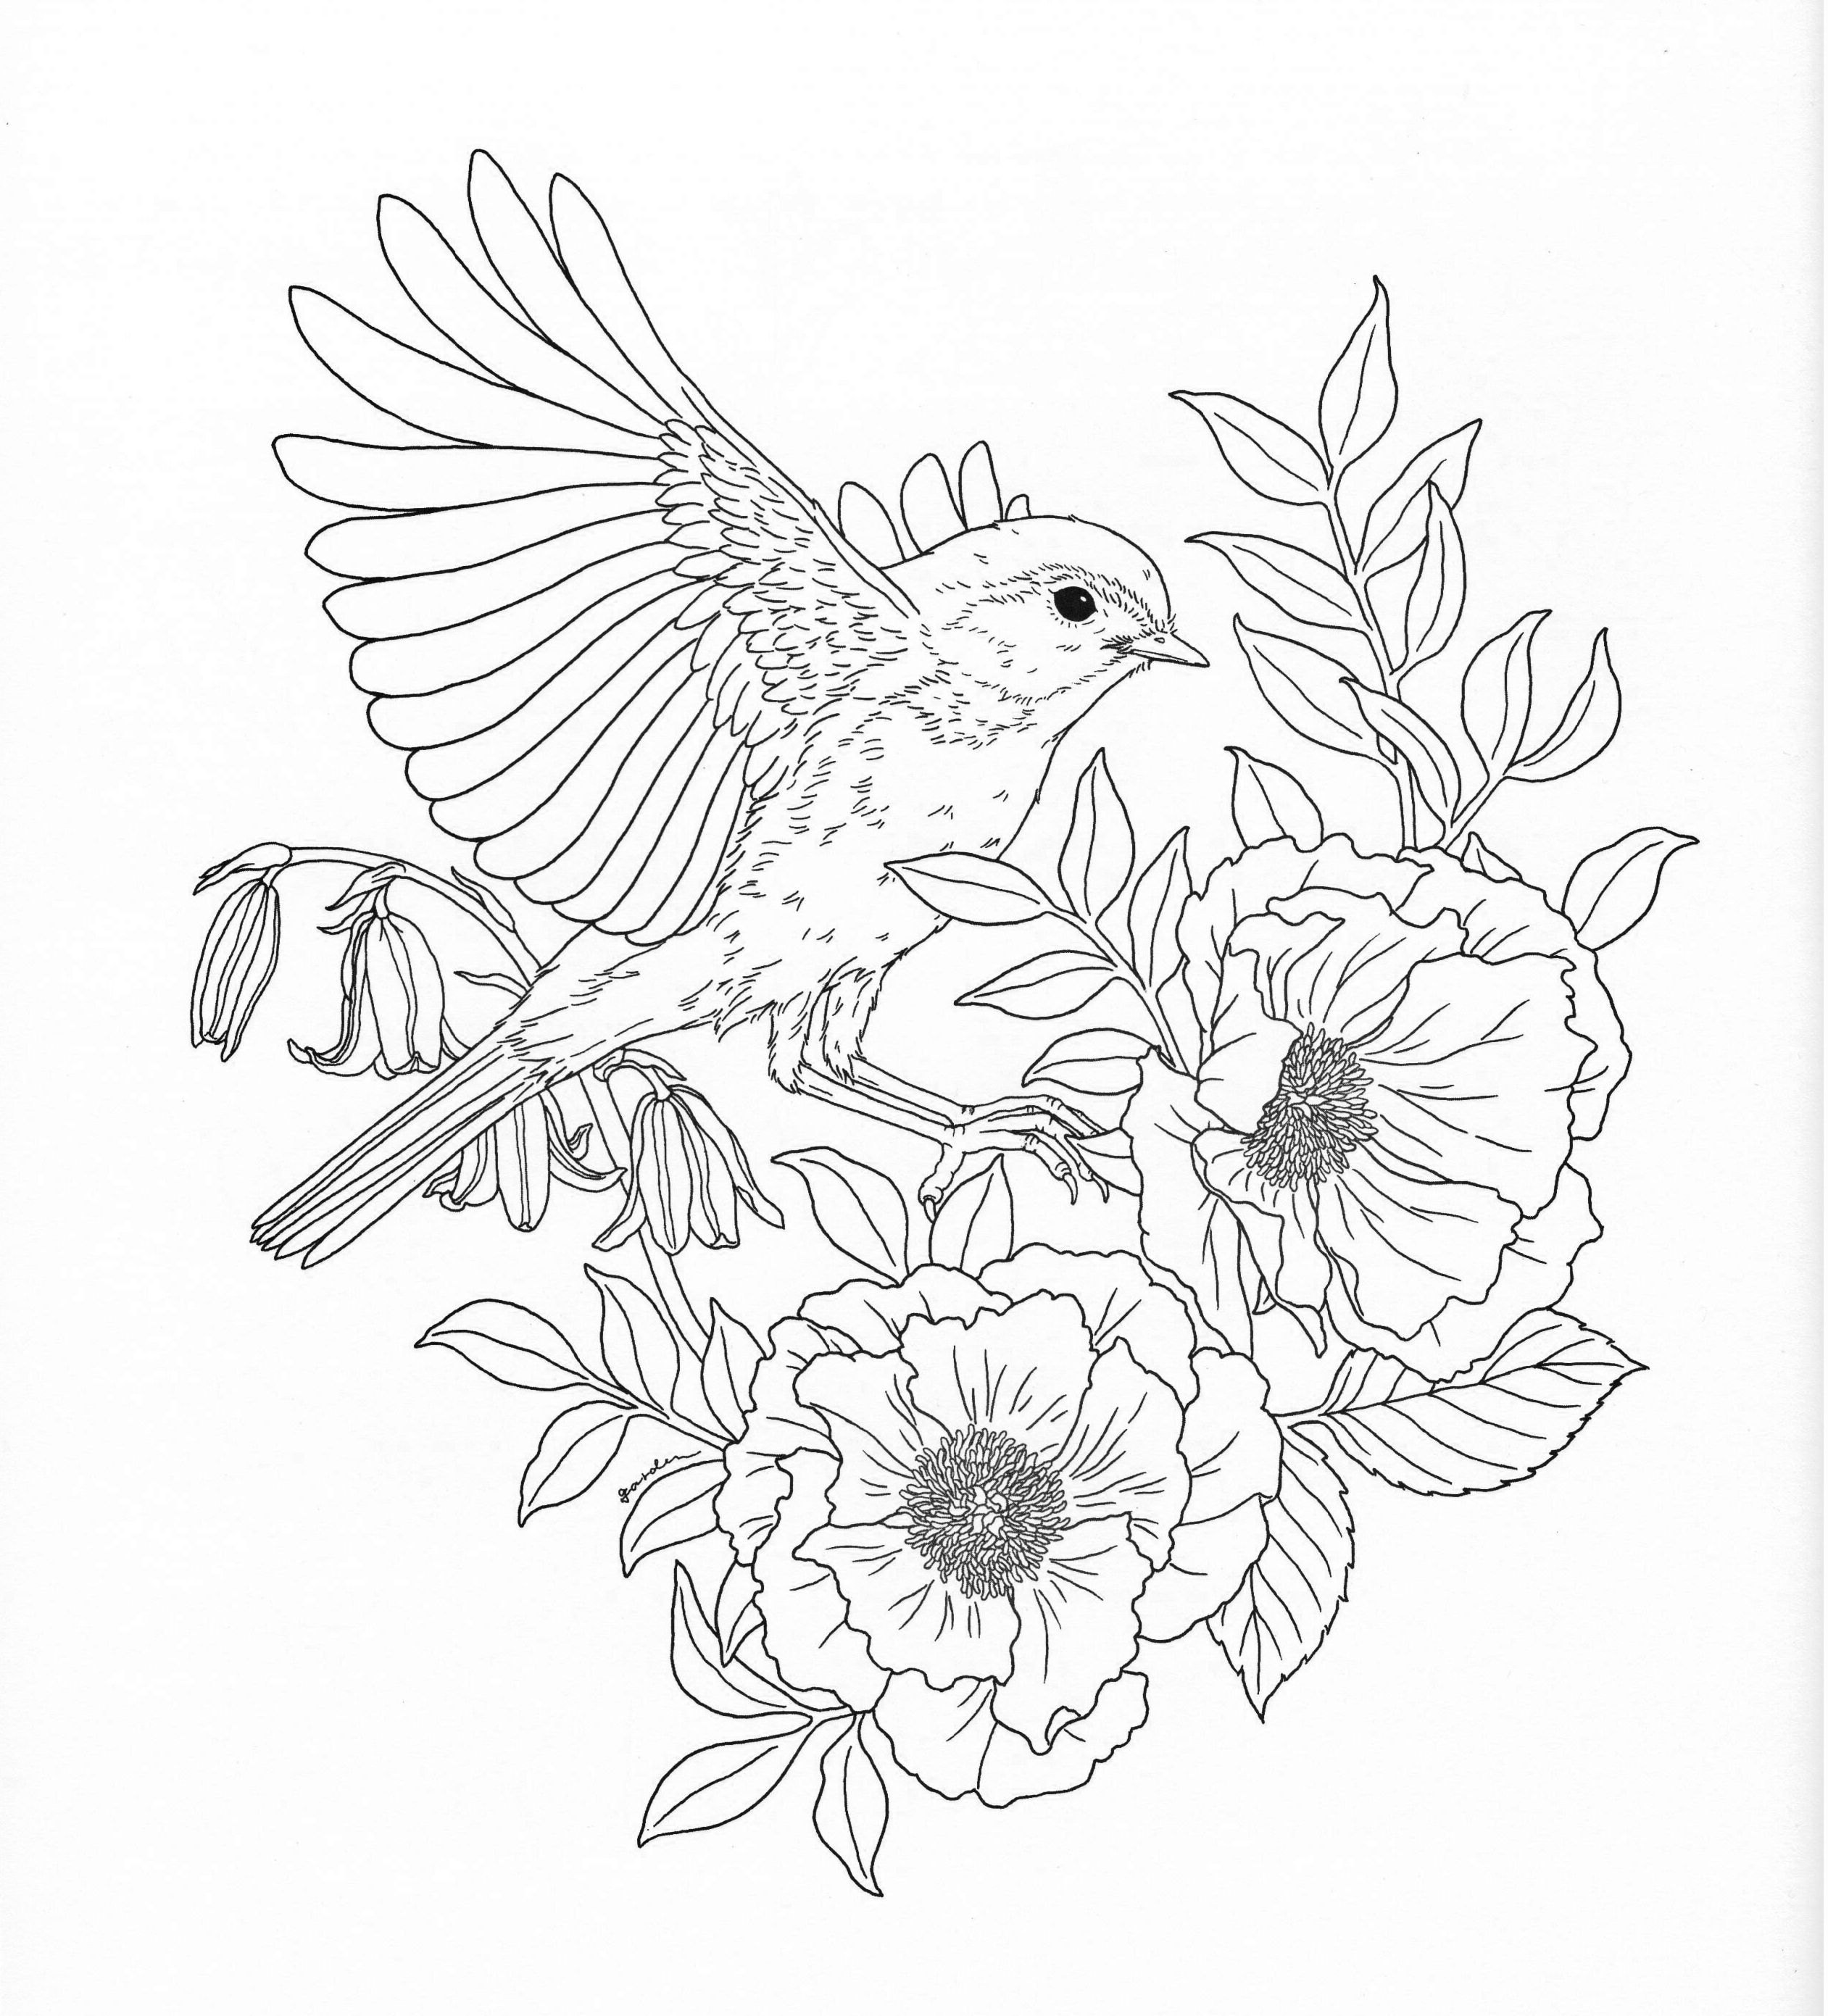 Bird Coloring Page Bird Coloring Pages Coloring Pages Nature Spring Coloring Pages